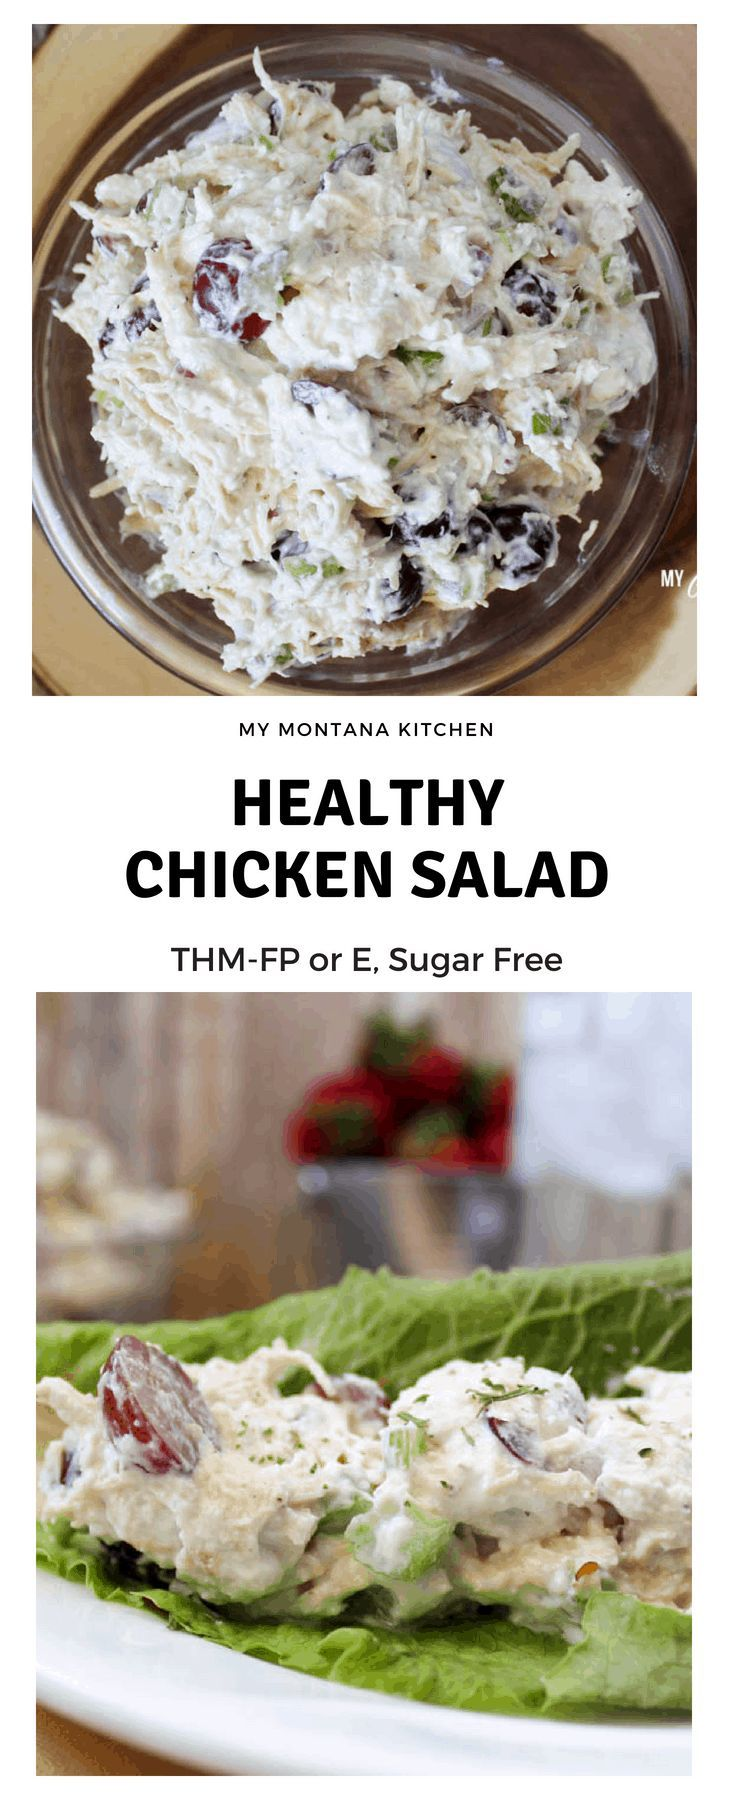 Healthy chicken salad thmfp or e sugar free